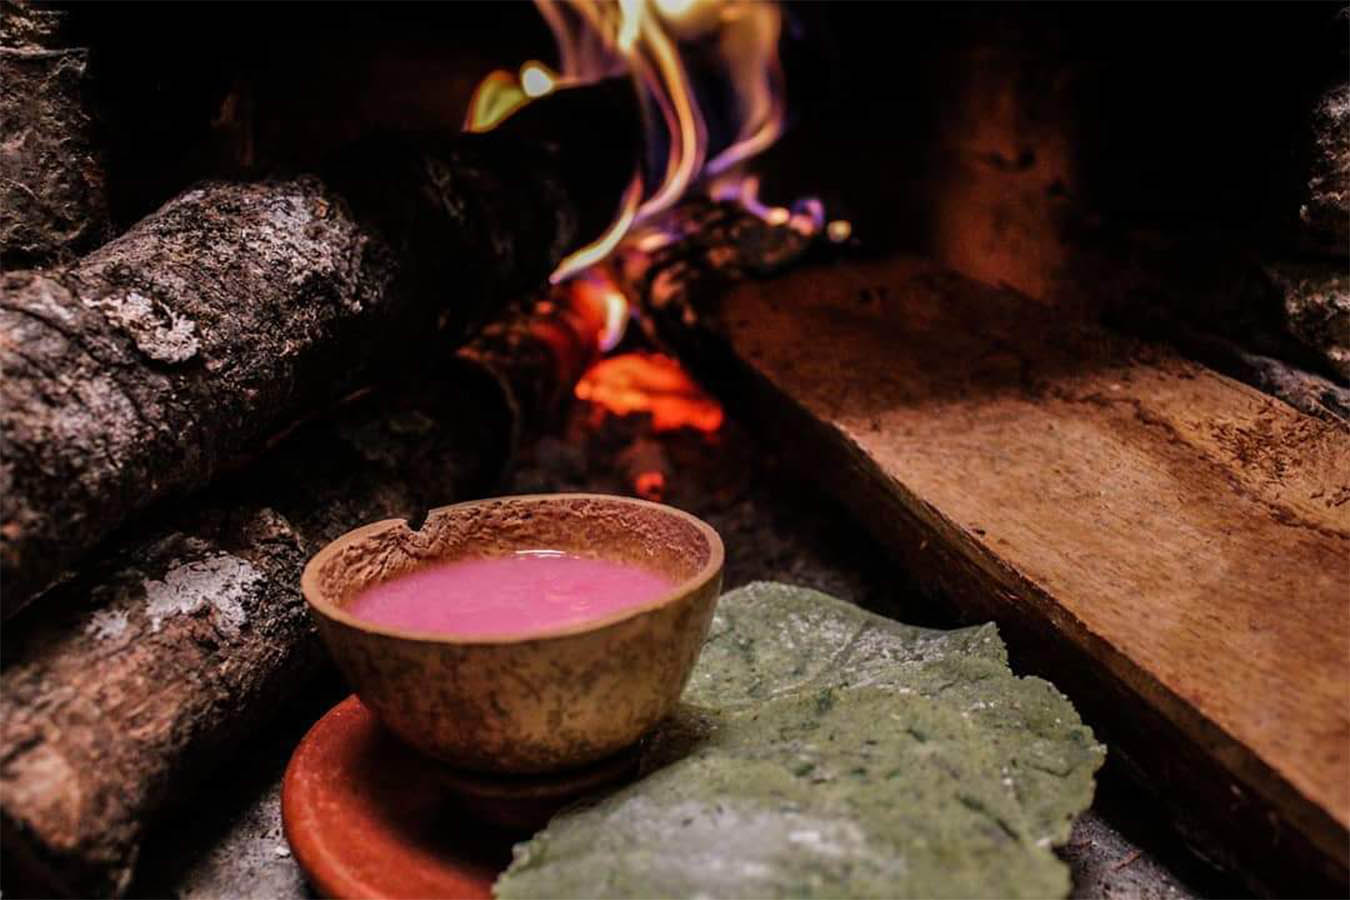 restaurante kokono san cristobal de las casas claudia ruiz maiz criollo atole